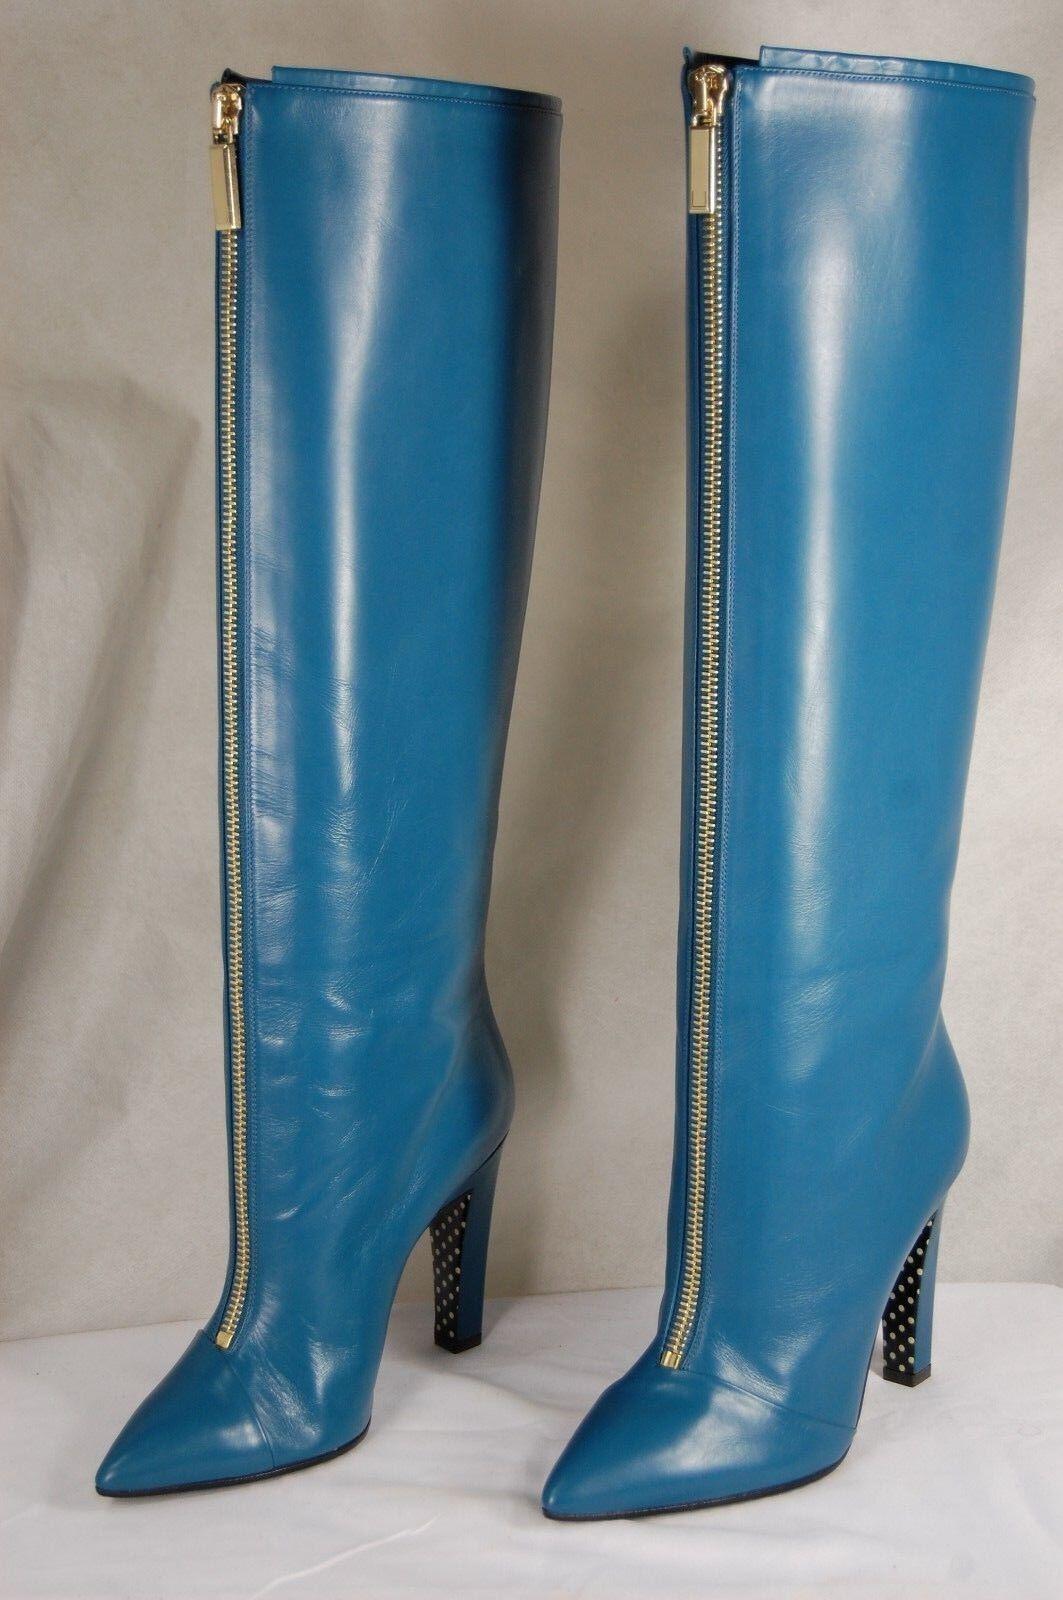 EMANUEL UNGARO MADE IN ITALY ITALY ITALY damen HIGH HEEL Blau LEATHER Stiefel EU 38 US 7.5 bf7f5d